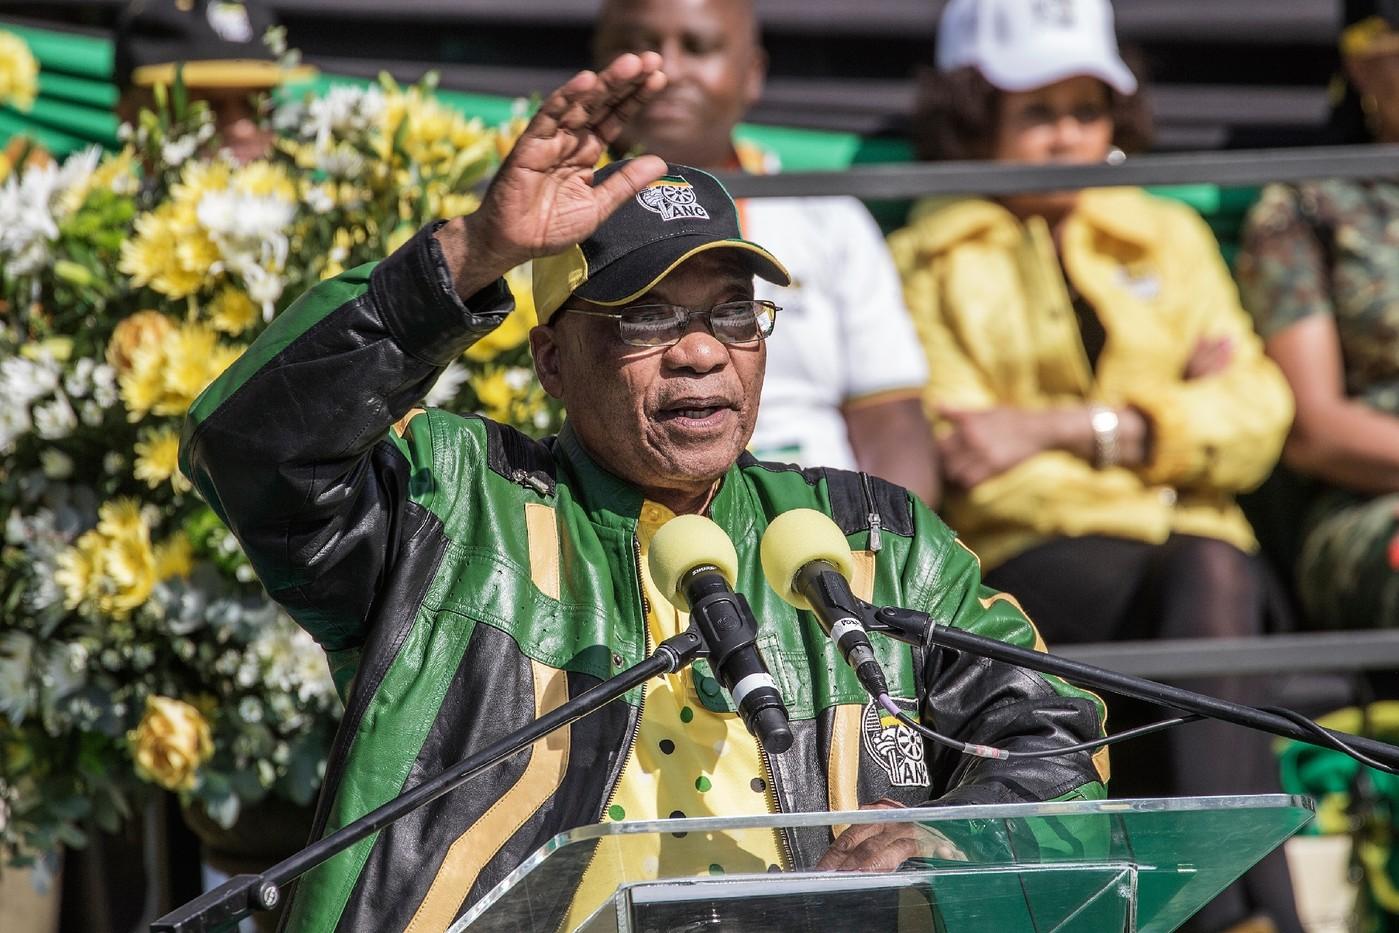 L'ANC de Zuma sous pression pour un scrutin local à l'enjeu national